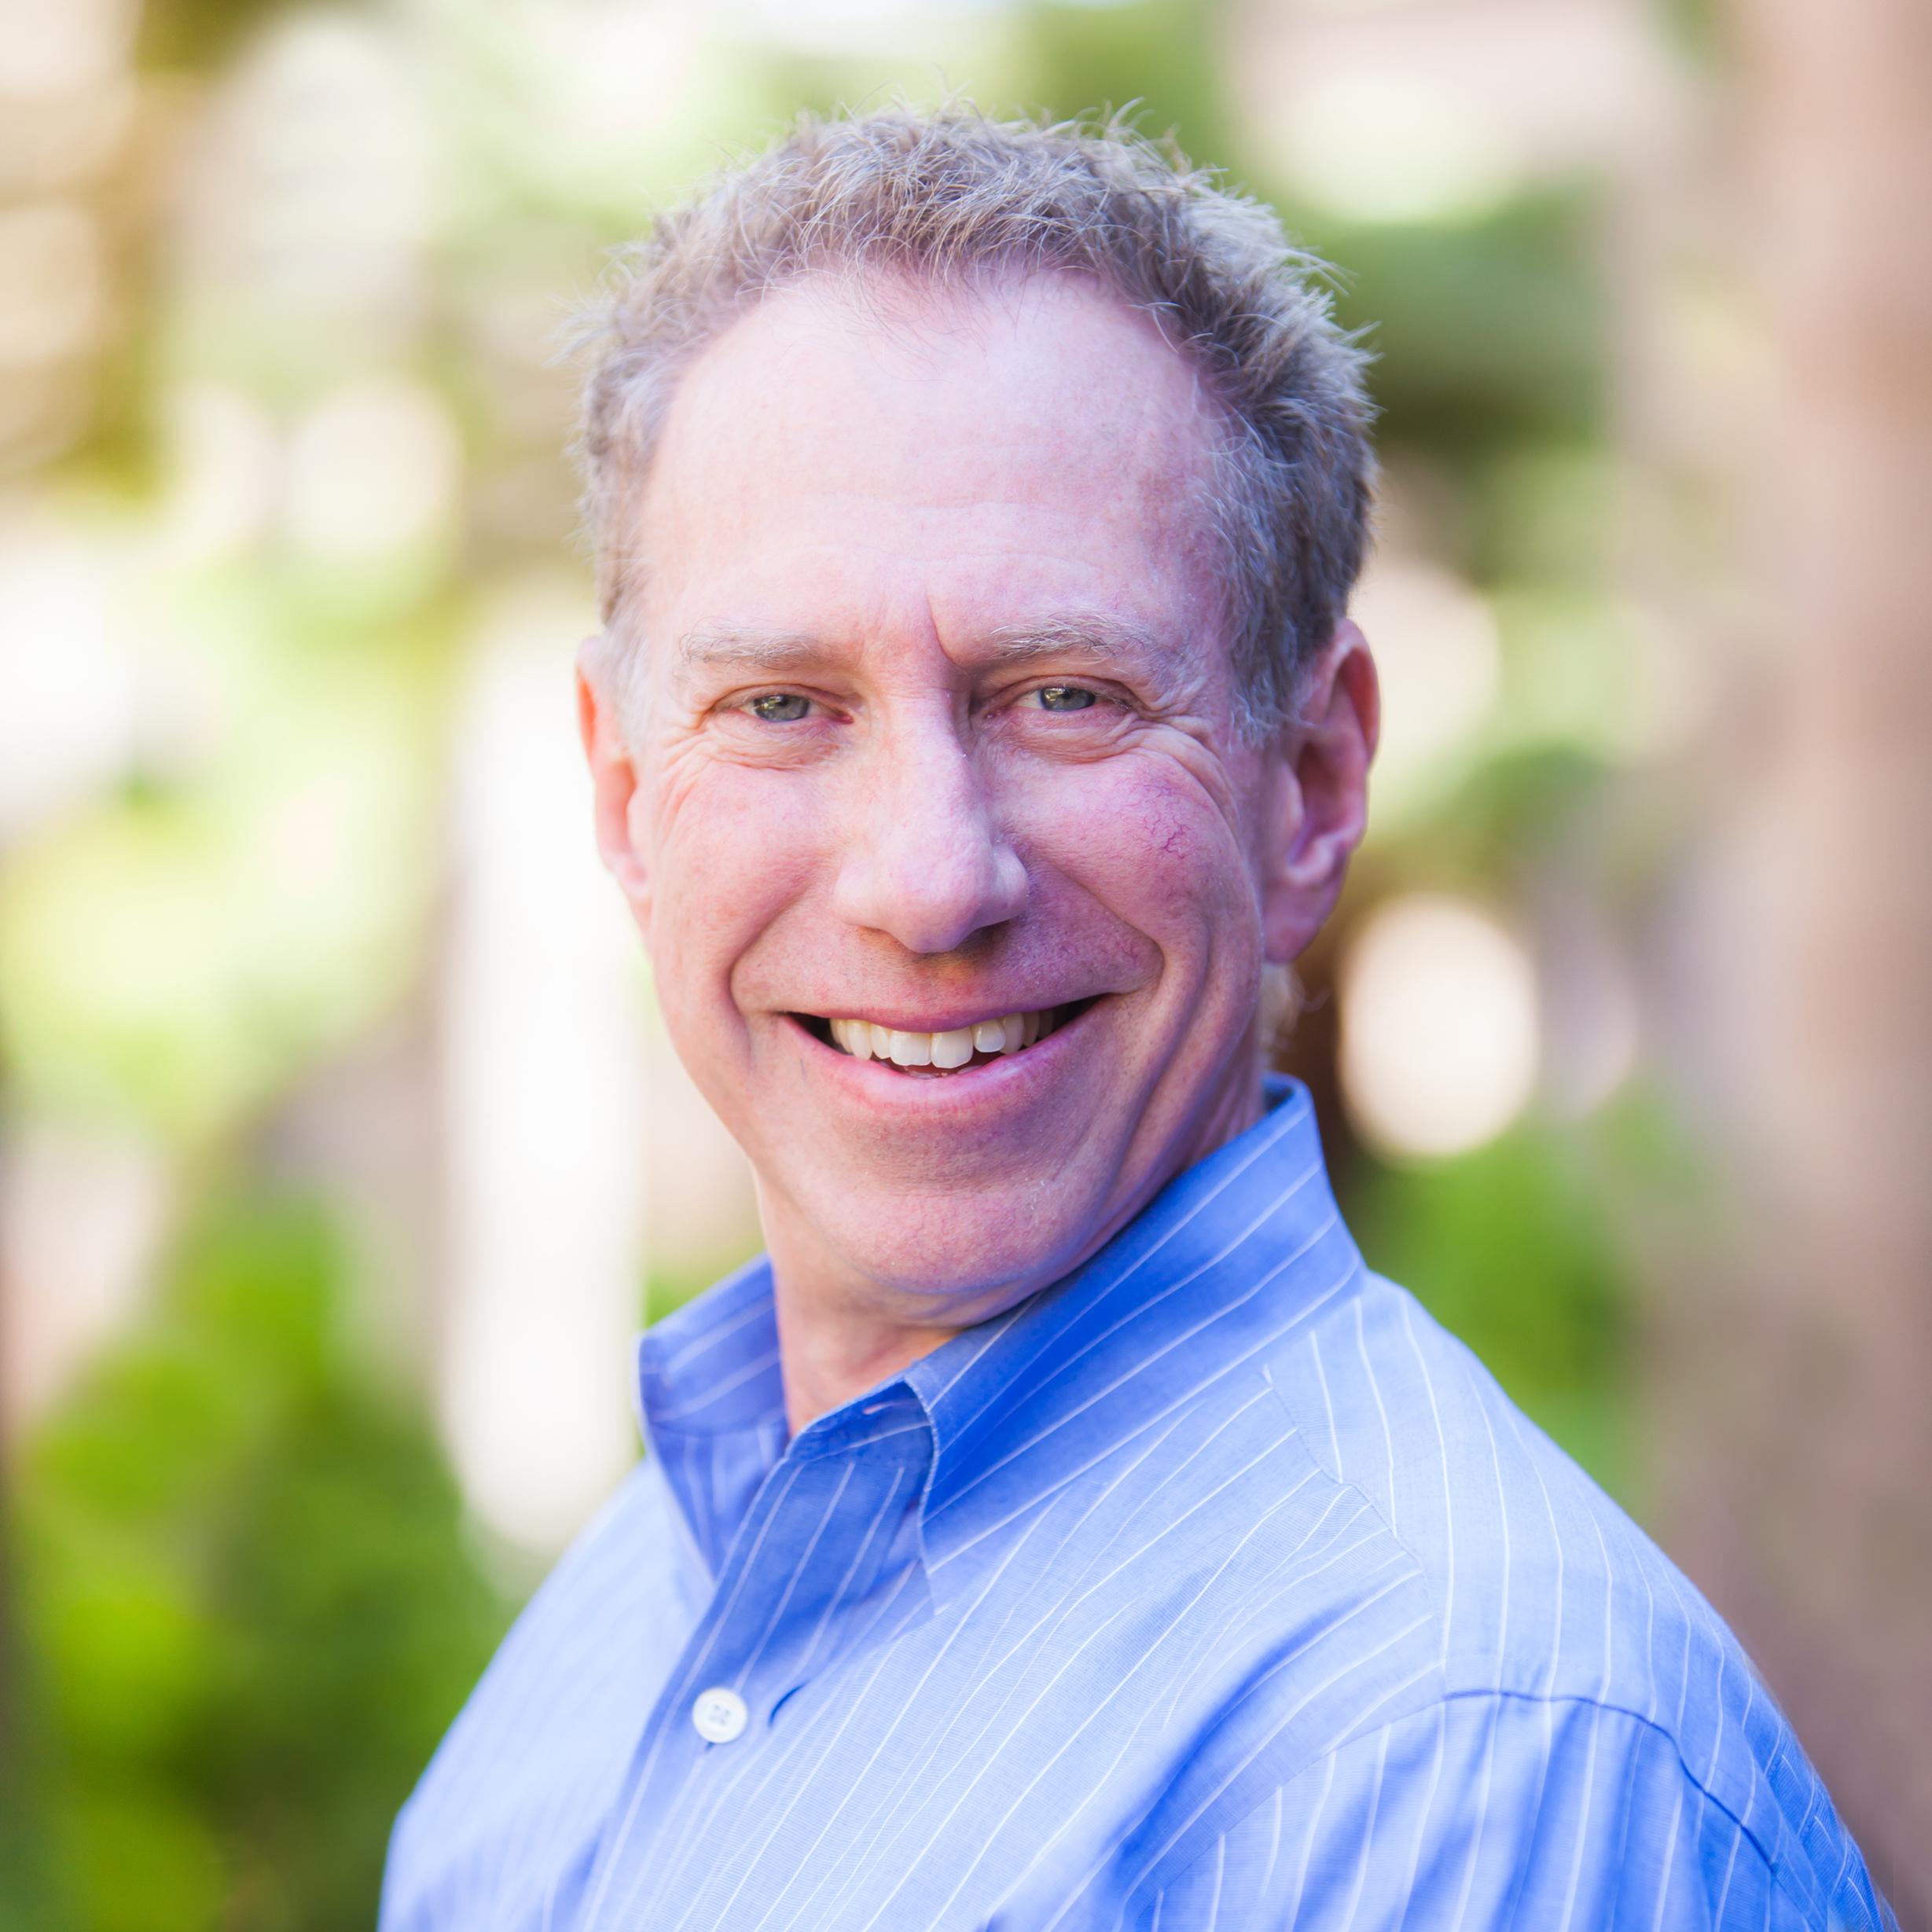 Mark Dale Mazur